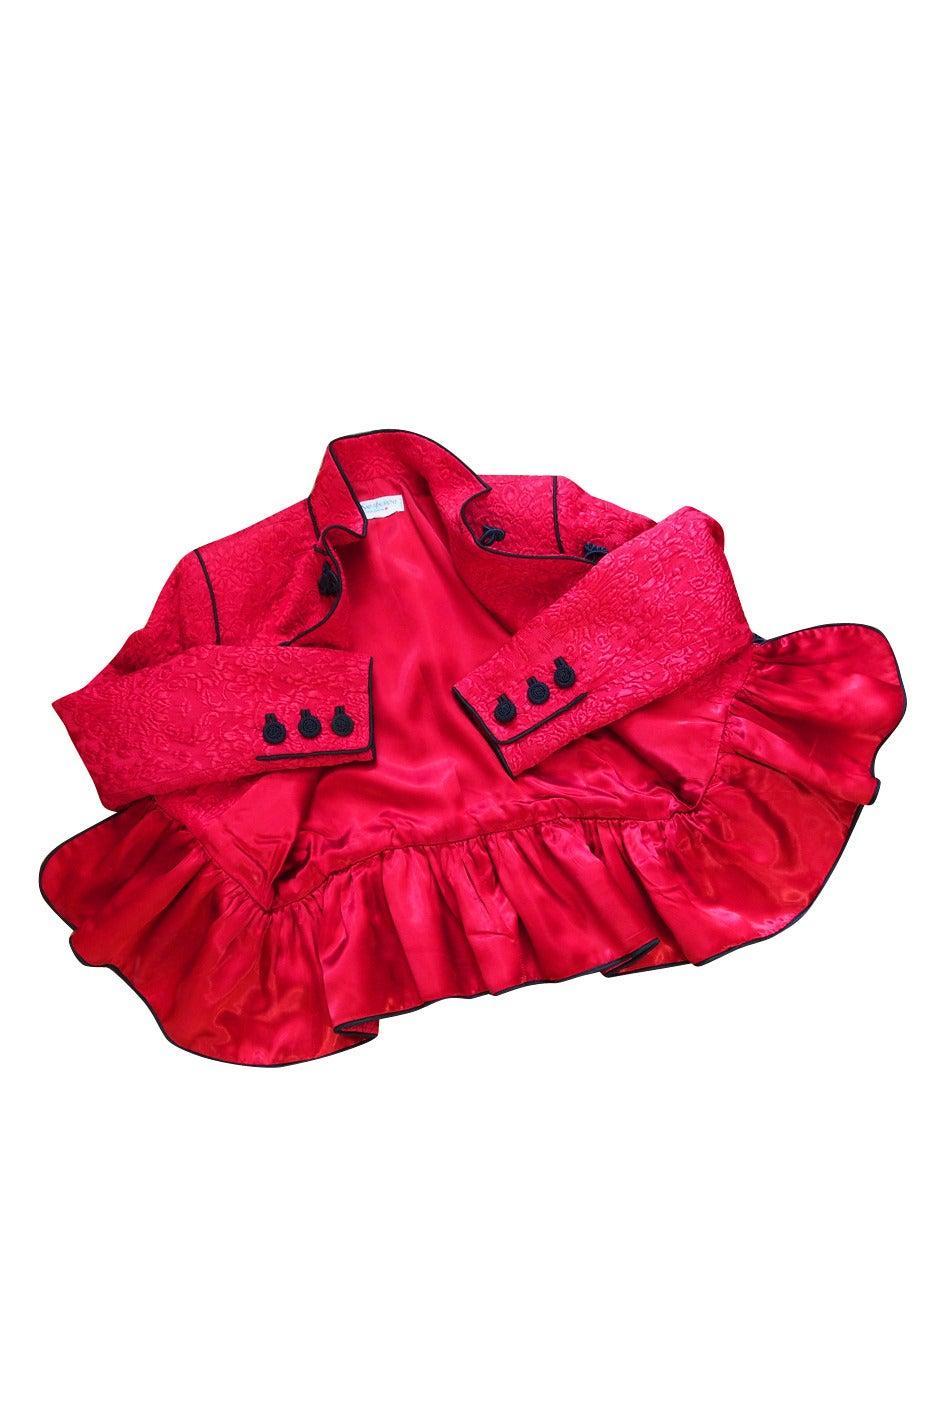 c1977-78 Yves Saint Laurent Chinoiserie Jacket 4